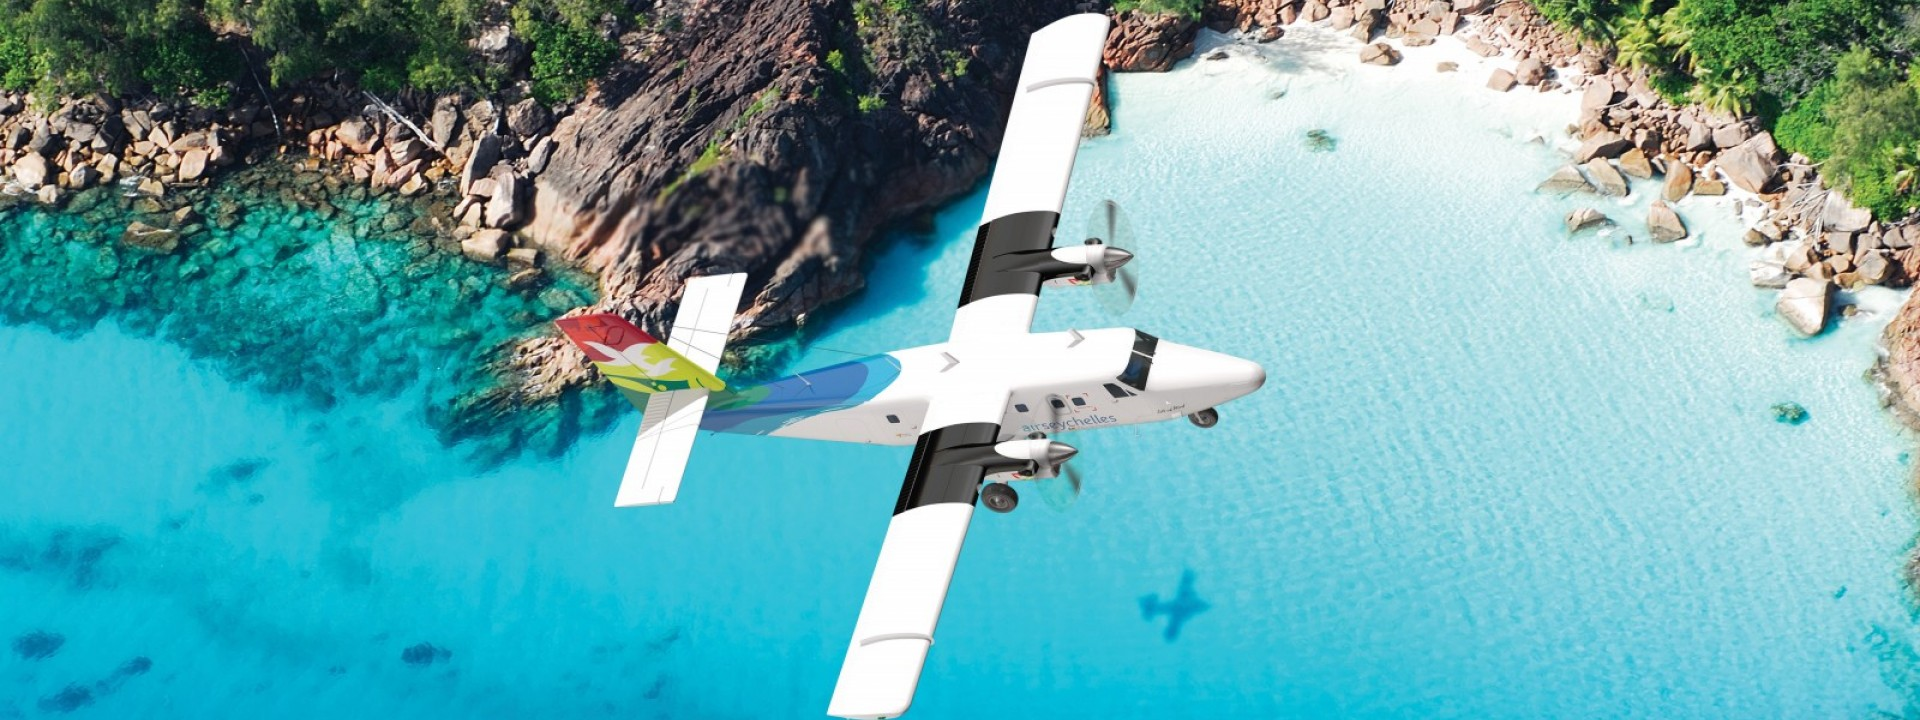 Air Seychelles Domestic Twin Otter Über den Inselstrand fliegen